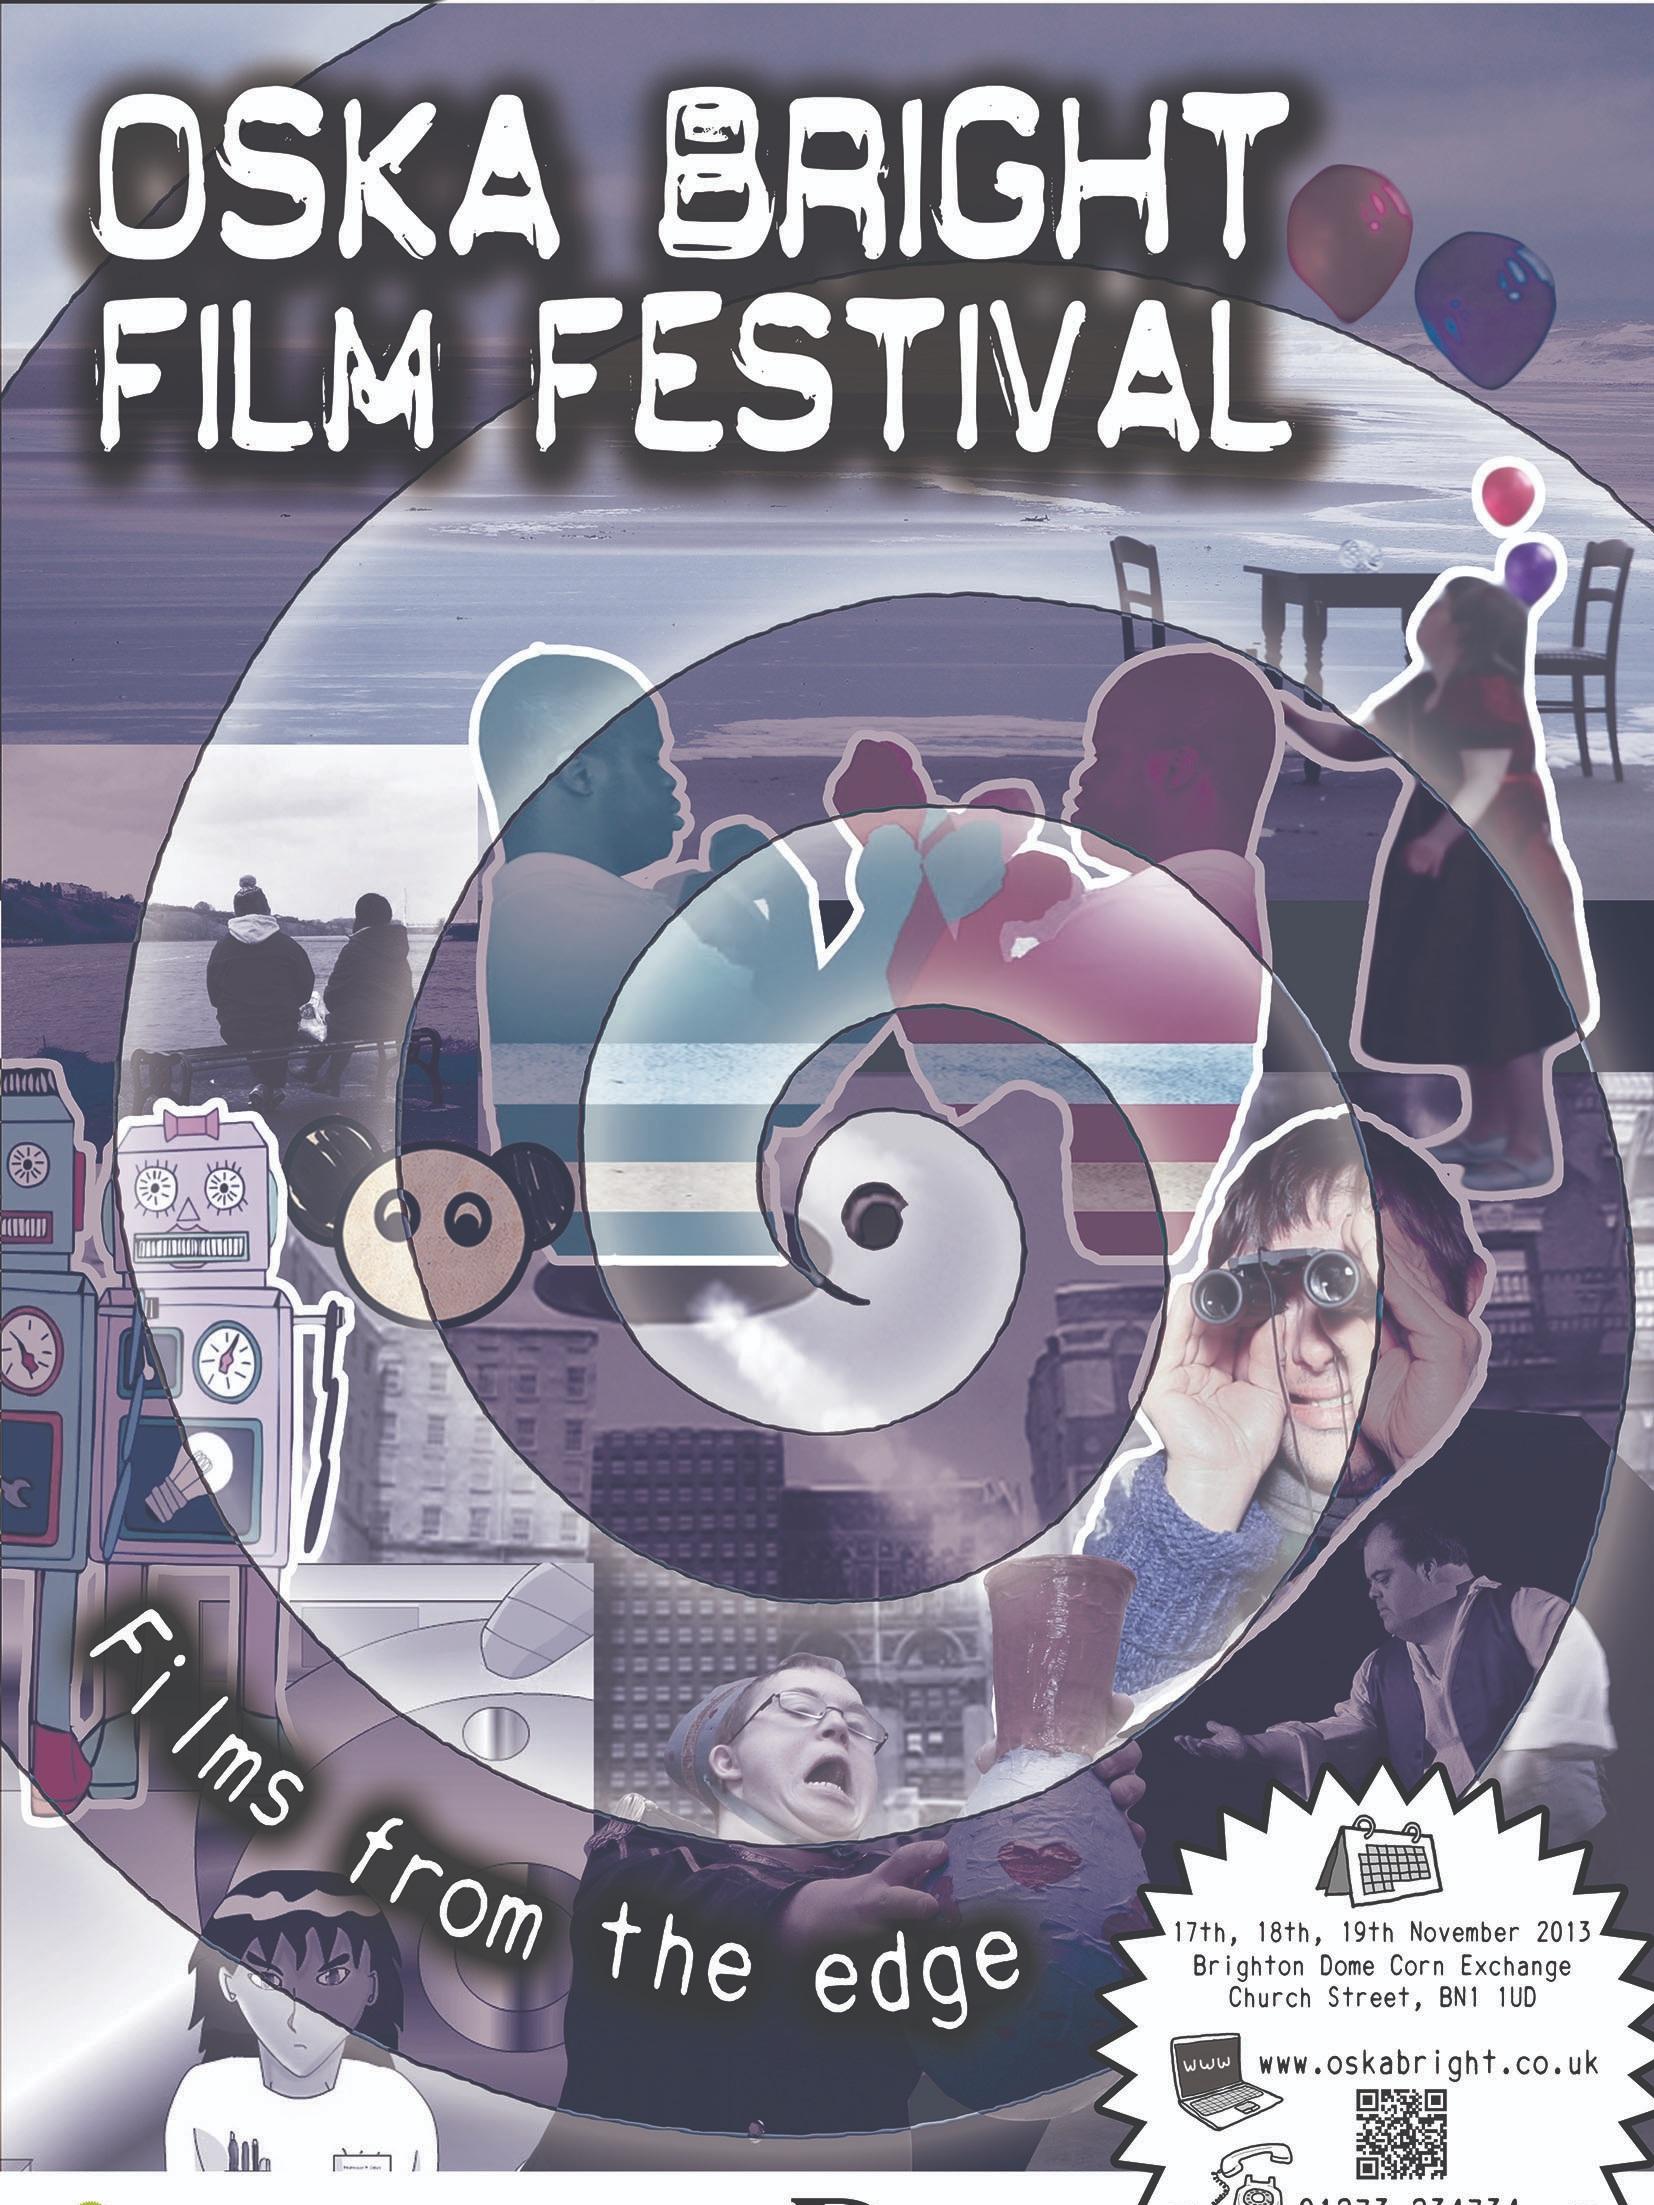 Oska Bright Film Festival 2013 Programme -